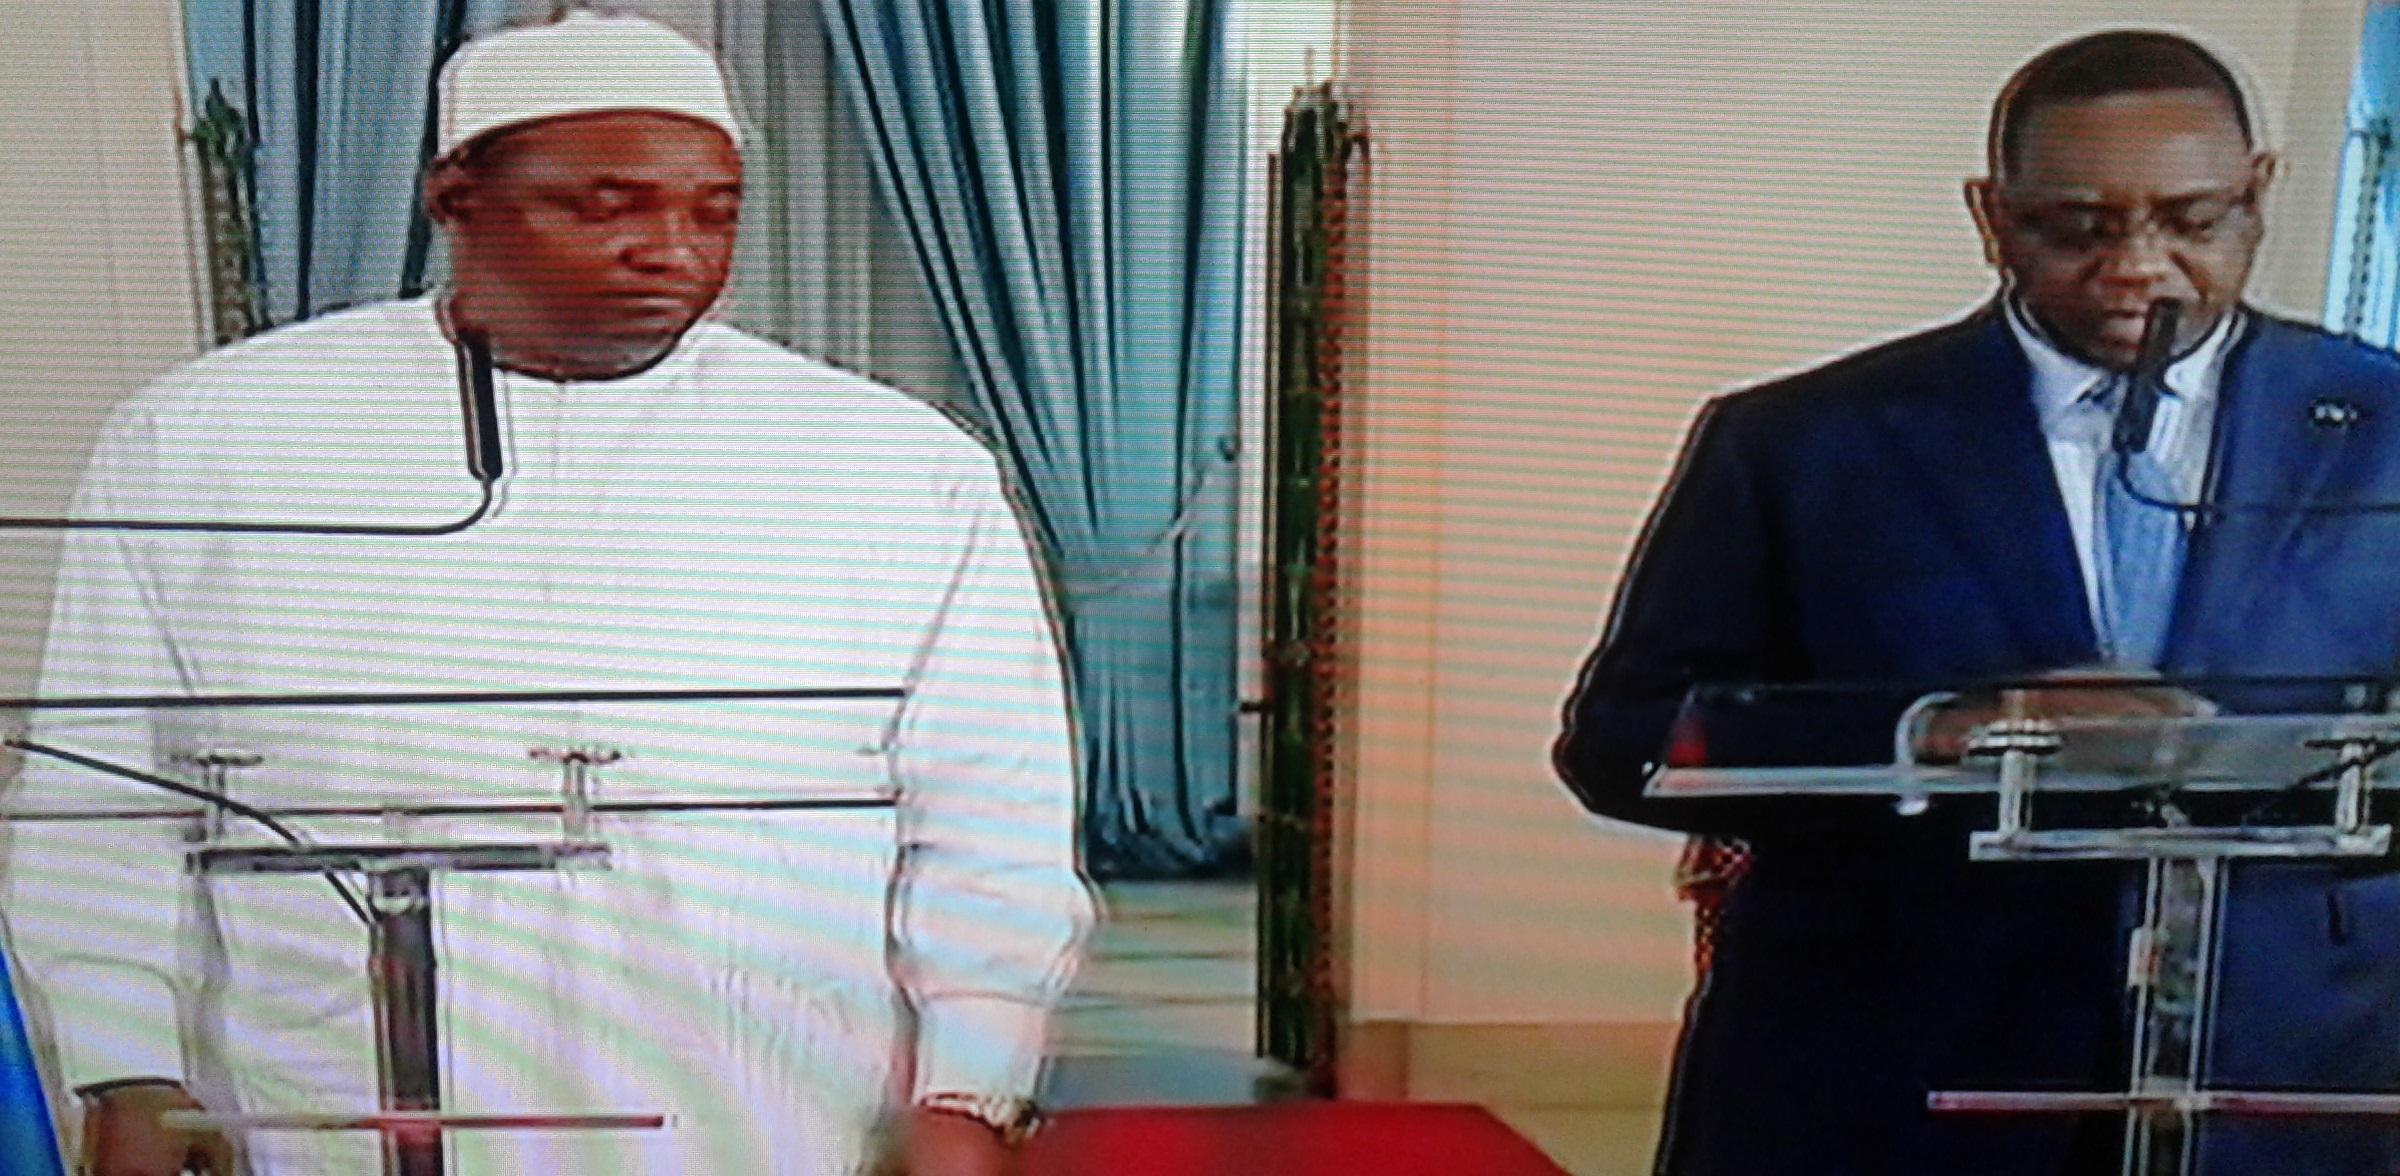 Coopération : Adama Barrow et Macky Sall en conférence de presse au palais prédidentiel